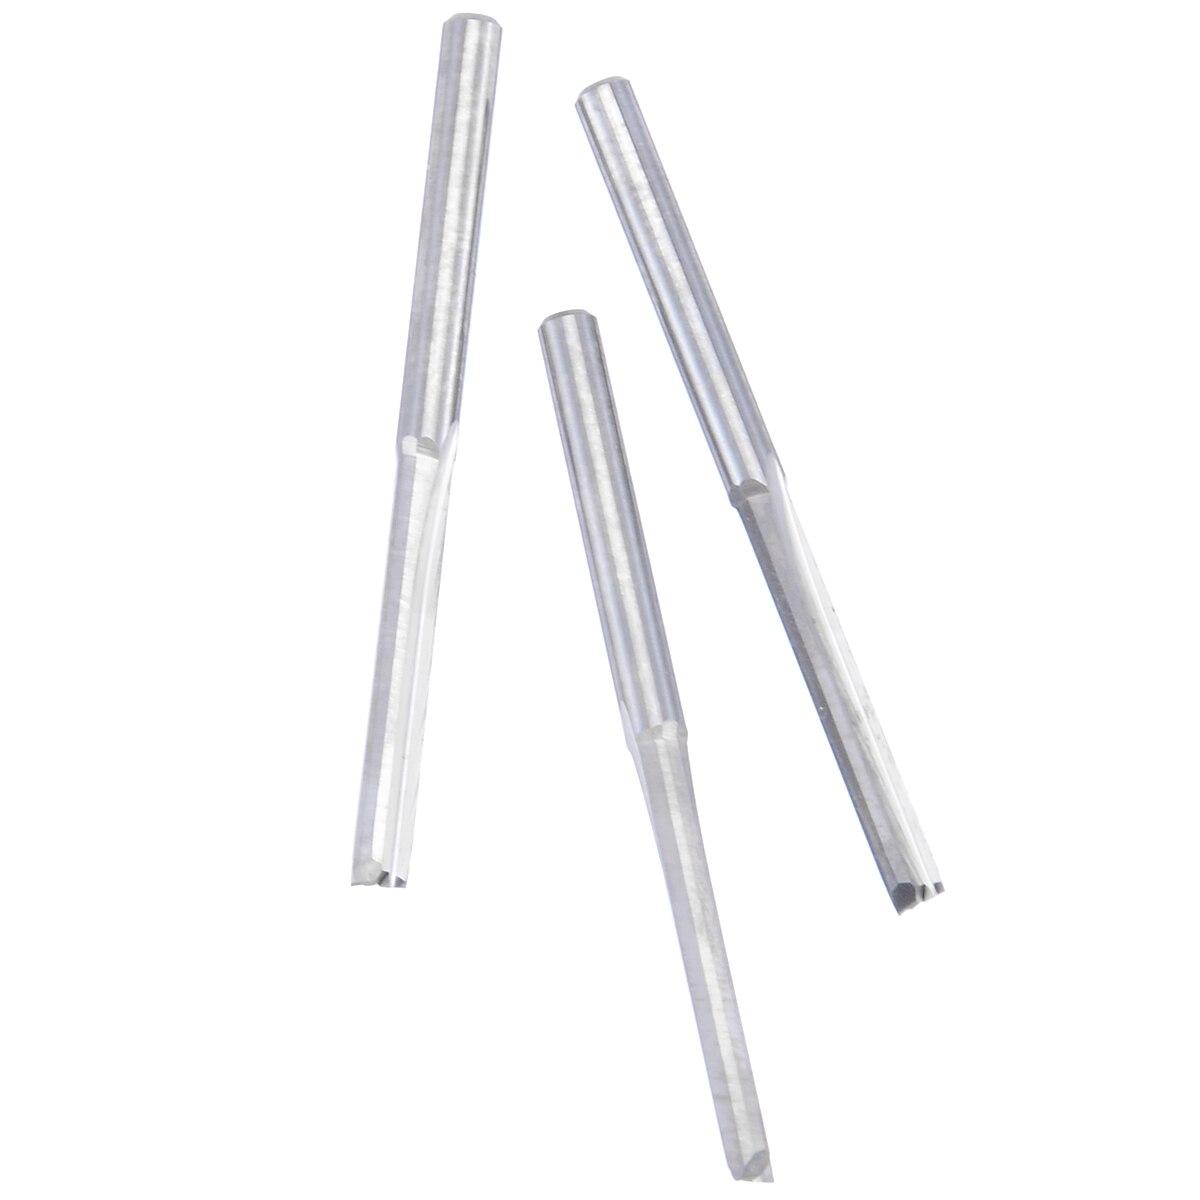 Купить с кэшбэком 10pcs 2 Flute End Mill Set 3.175mm Shank Tungsten Carbide CNC Milling Cutter For Woodworking Engraving Machine